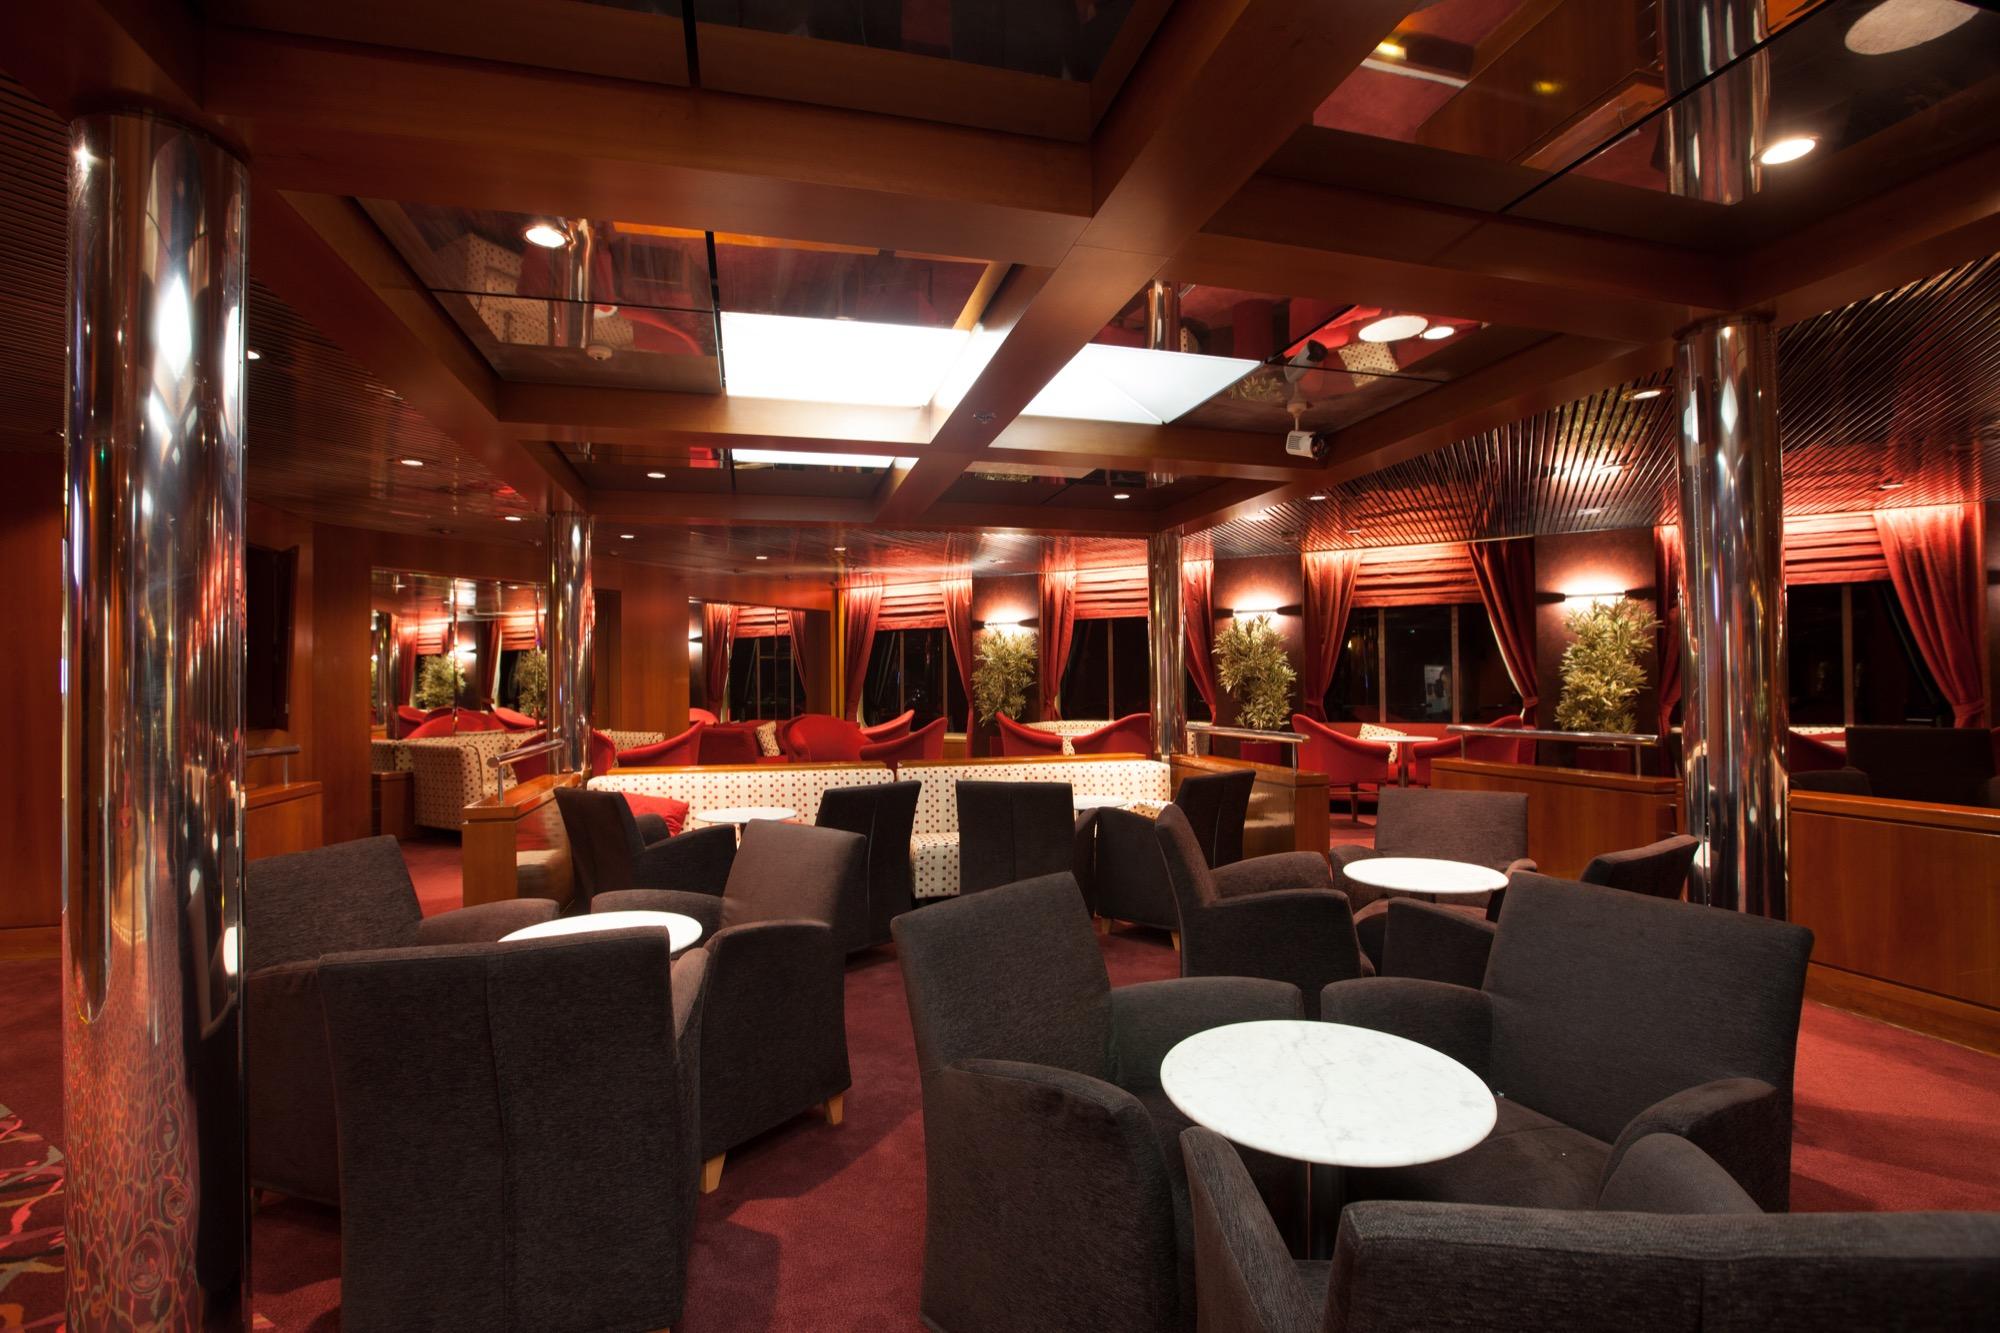 Pullmantur Zenith Interior Rendez-Vous Lounge 2.jpg